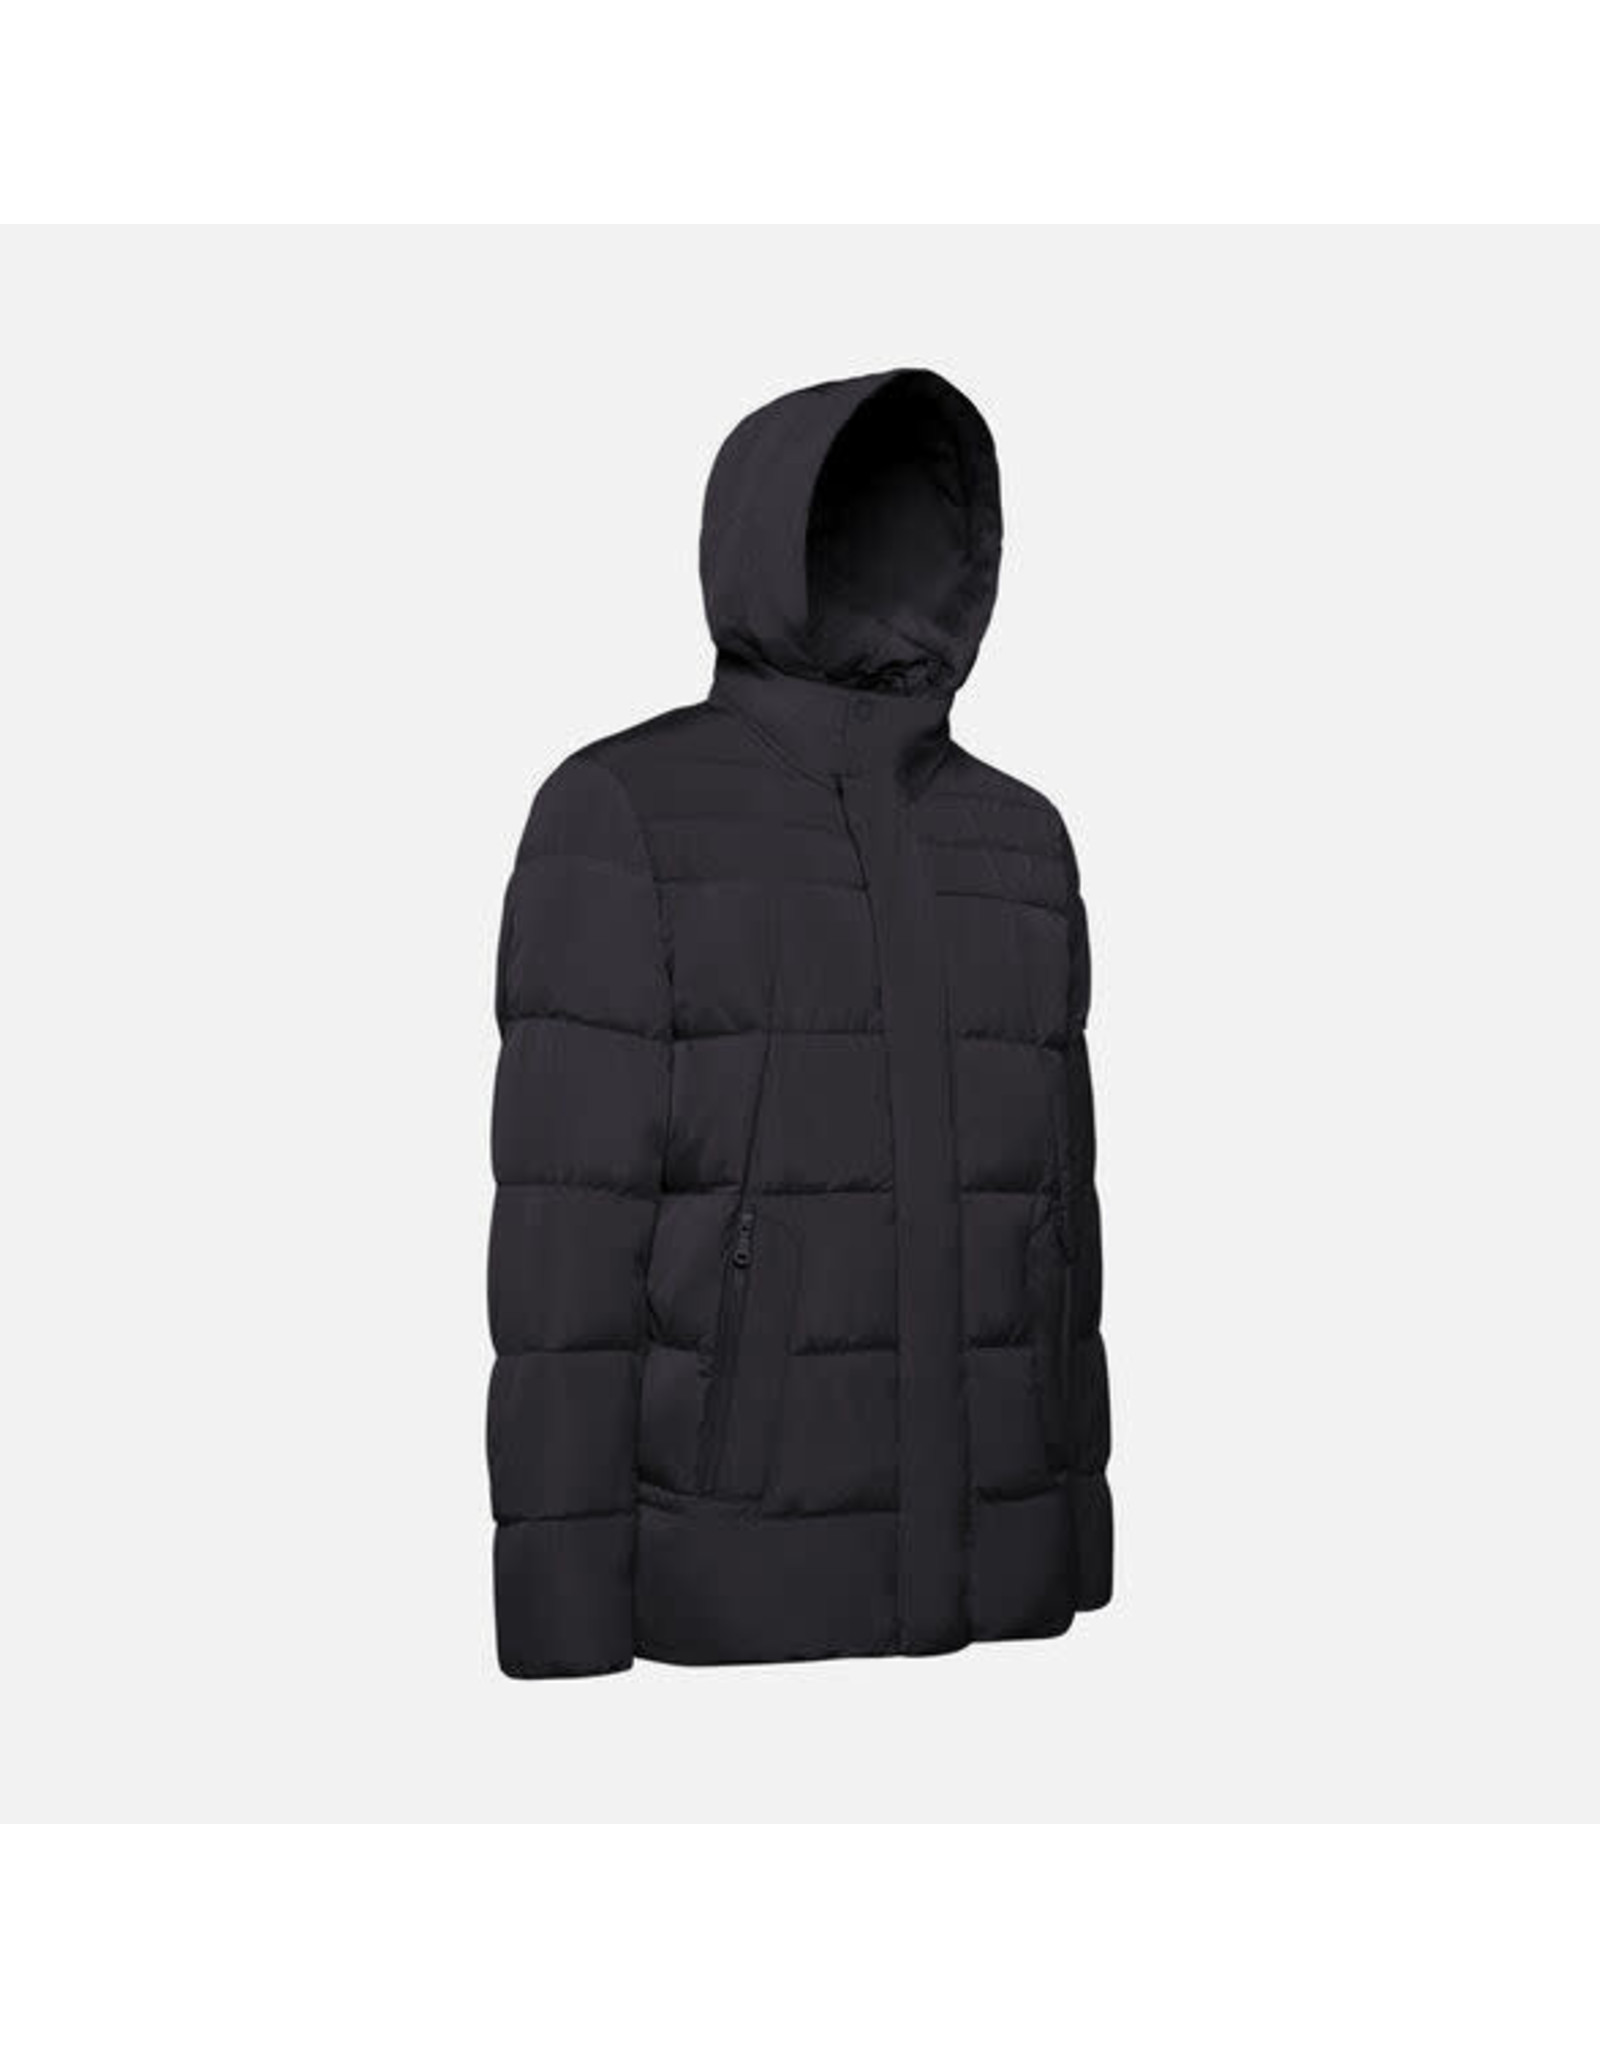 Geox Hilstone Padded Coat